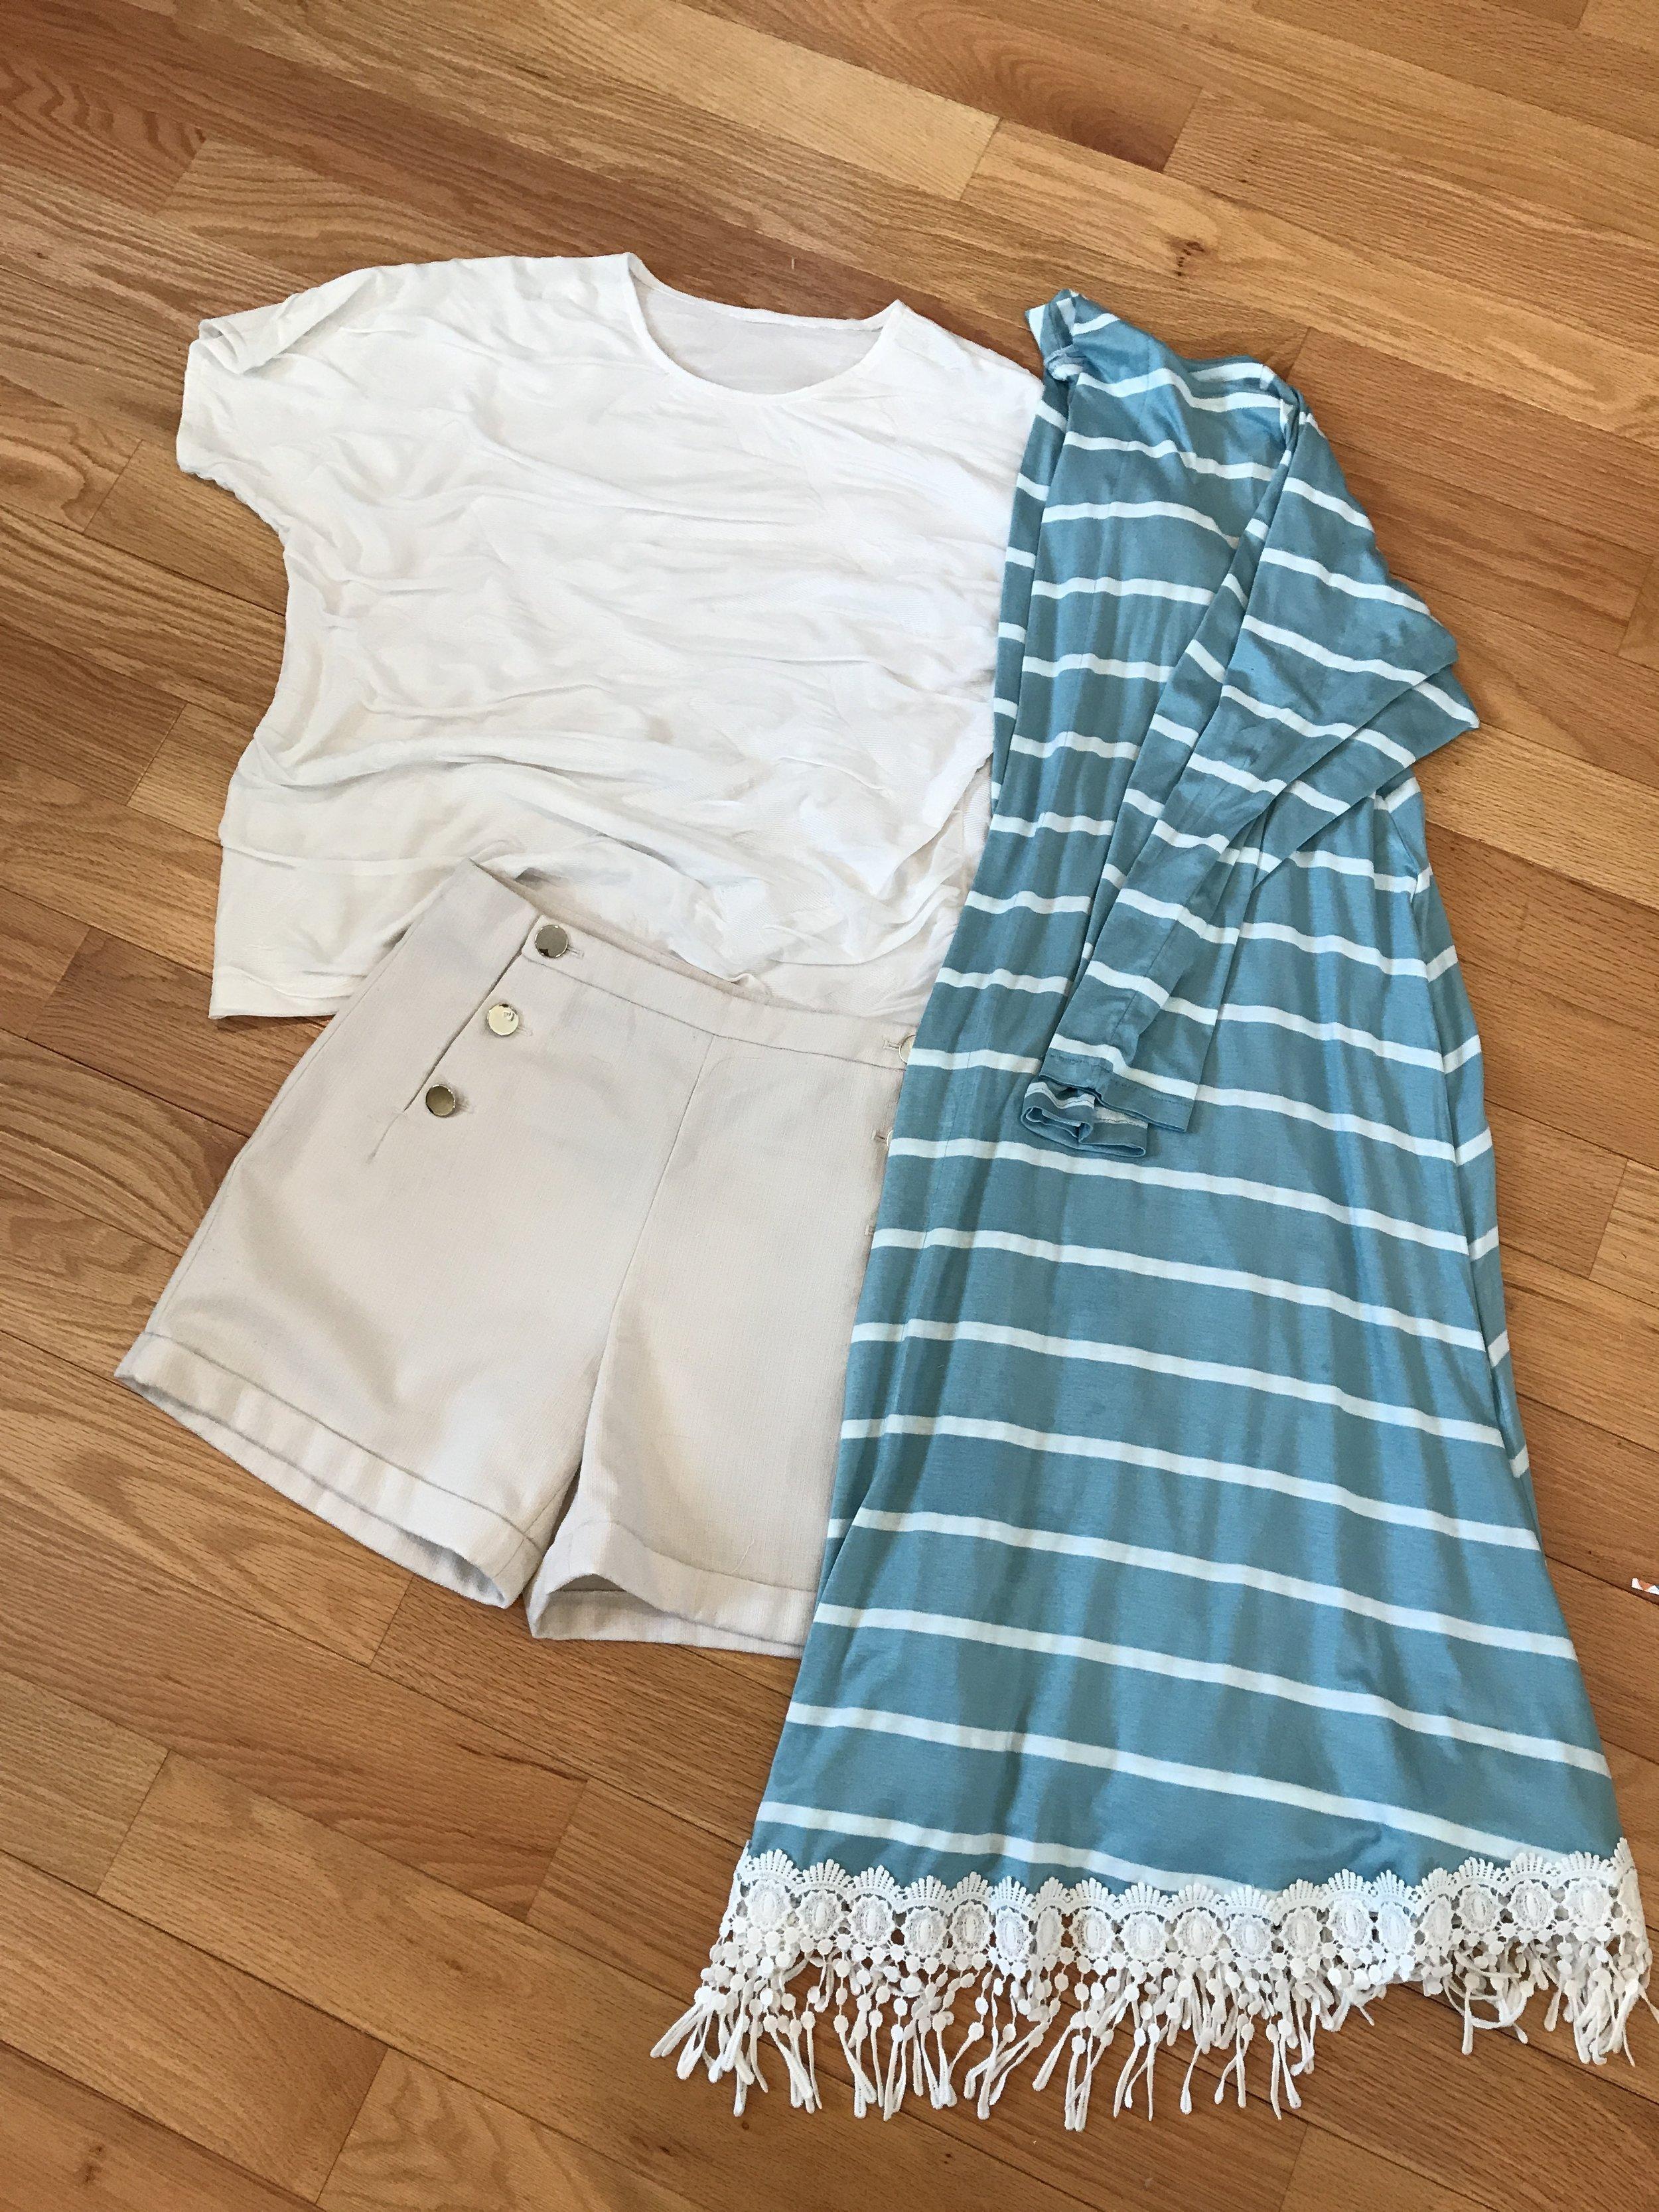 Sewing a Spring Break Capsule Wardrobe with Christine Jonson Patterns